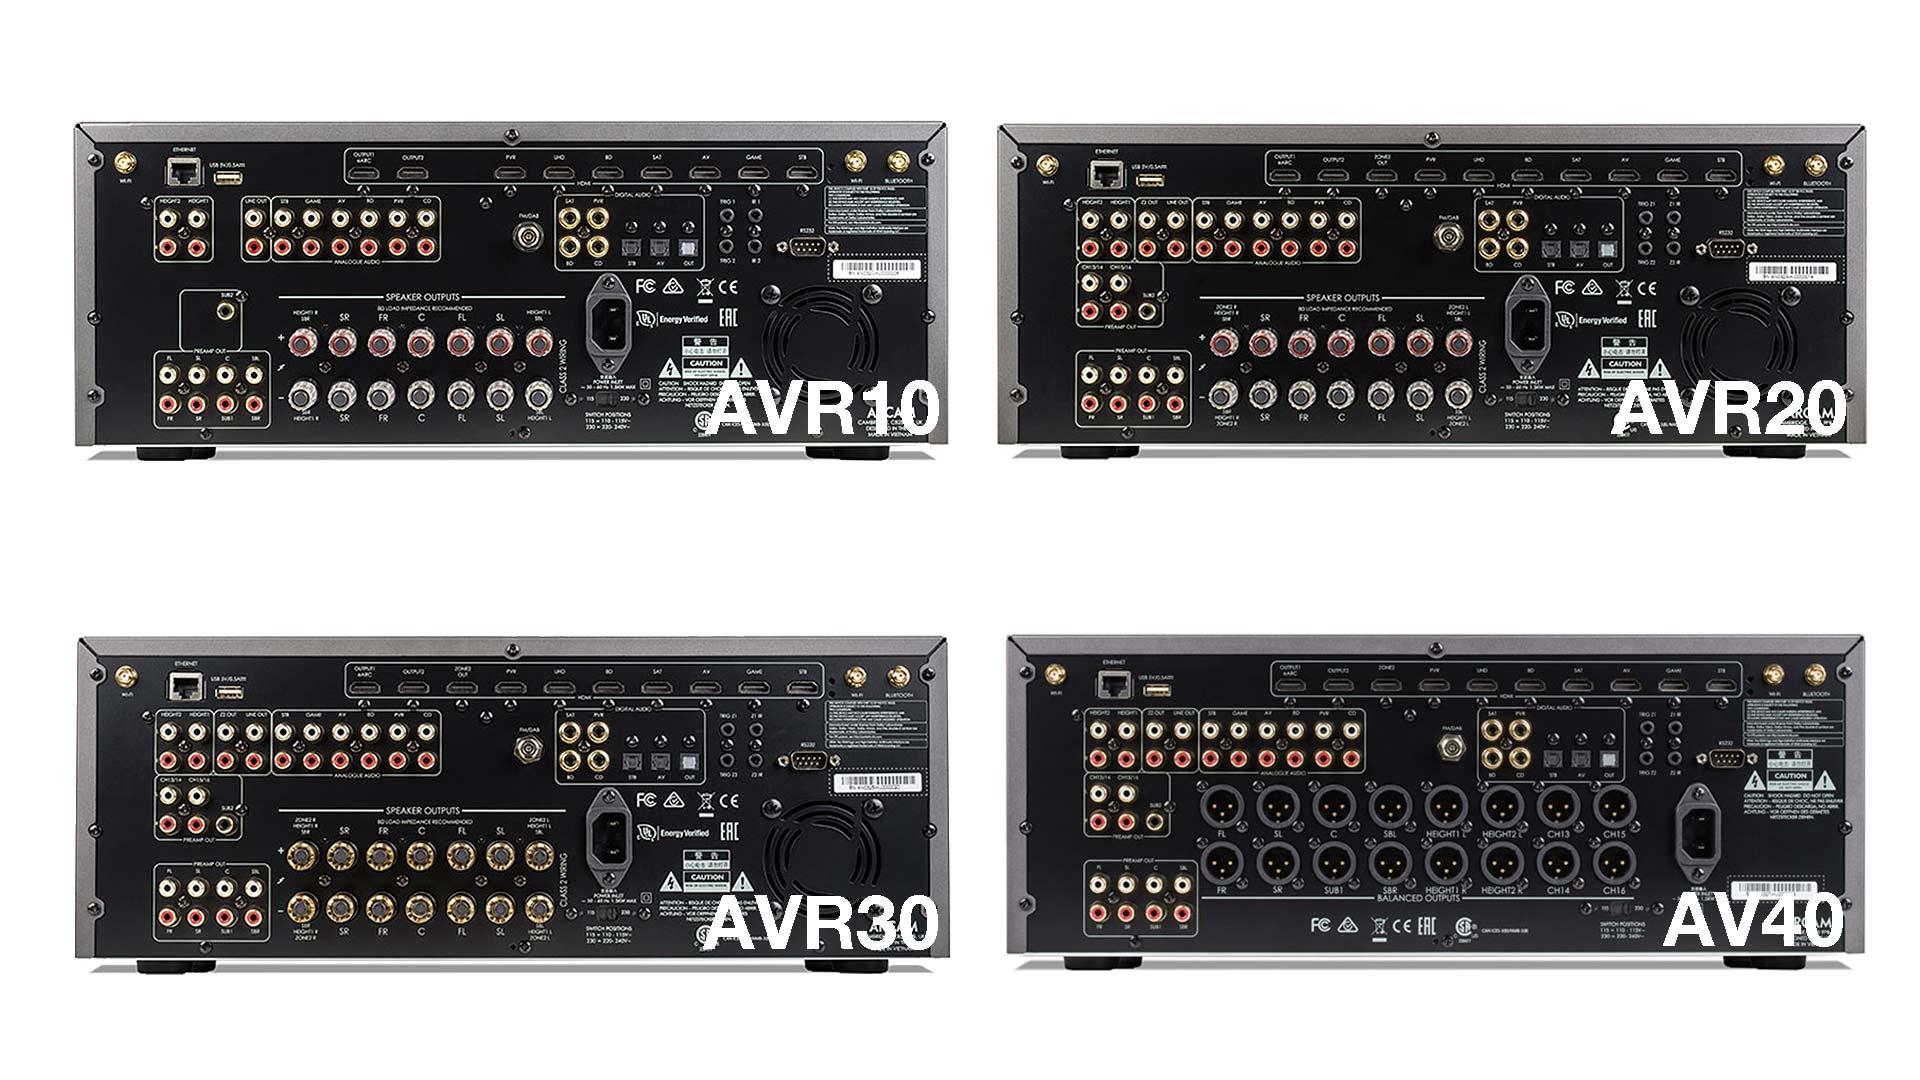 New Arcam Home Theatre AV Products | Unilet Sound & Vision